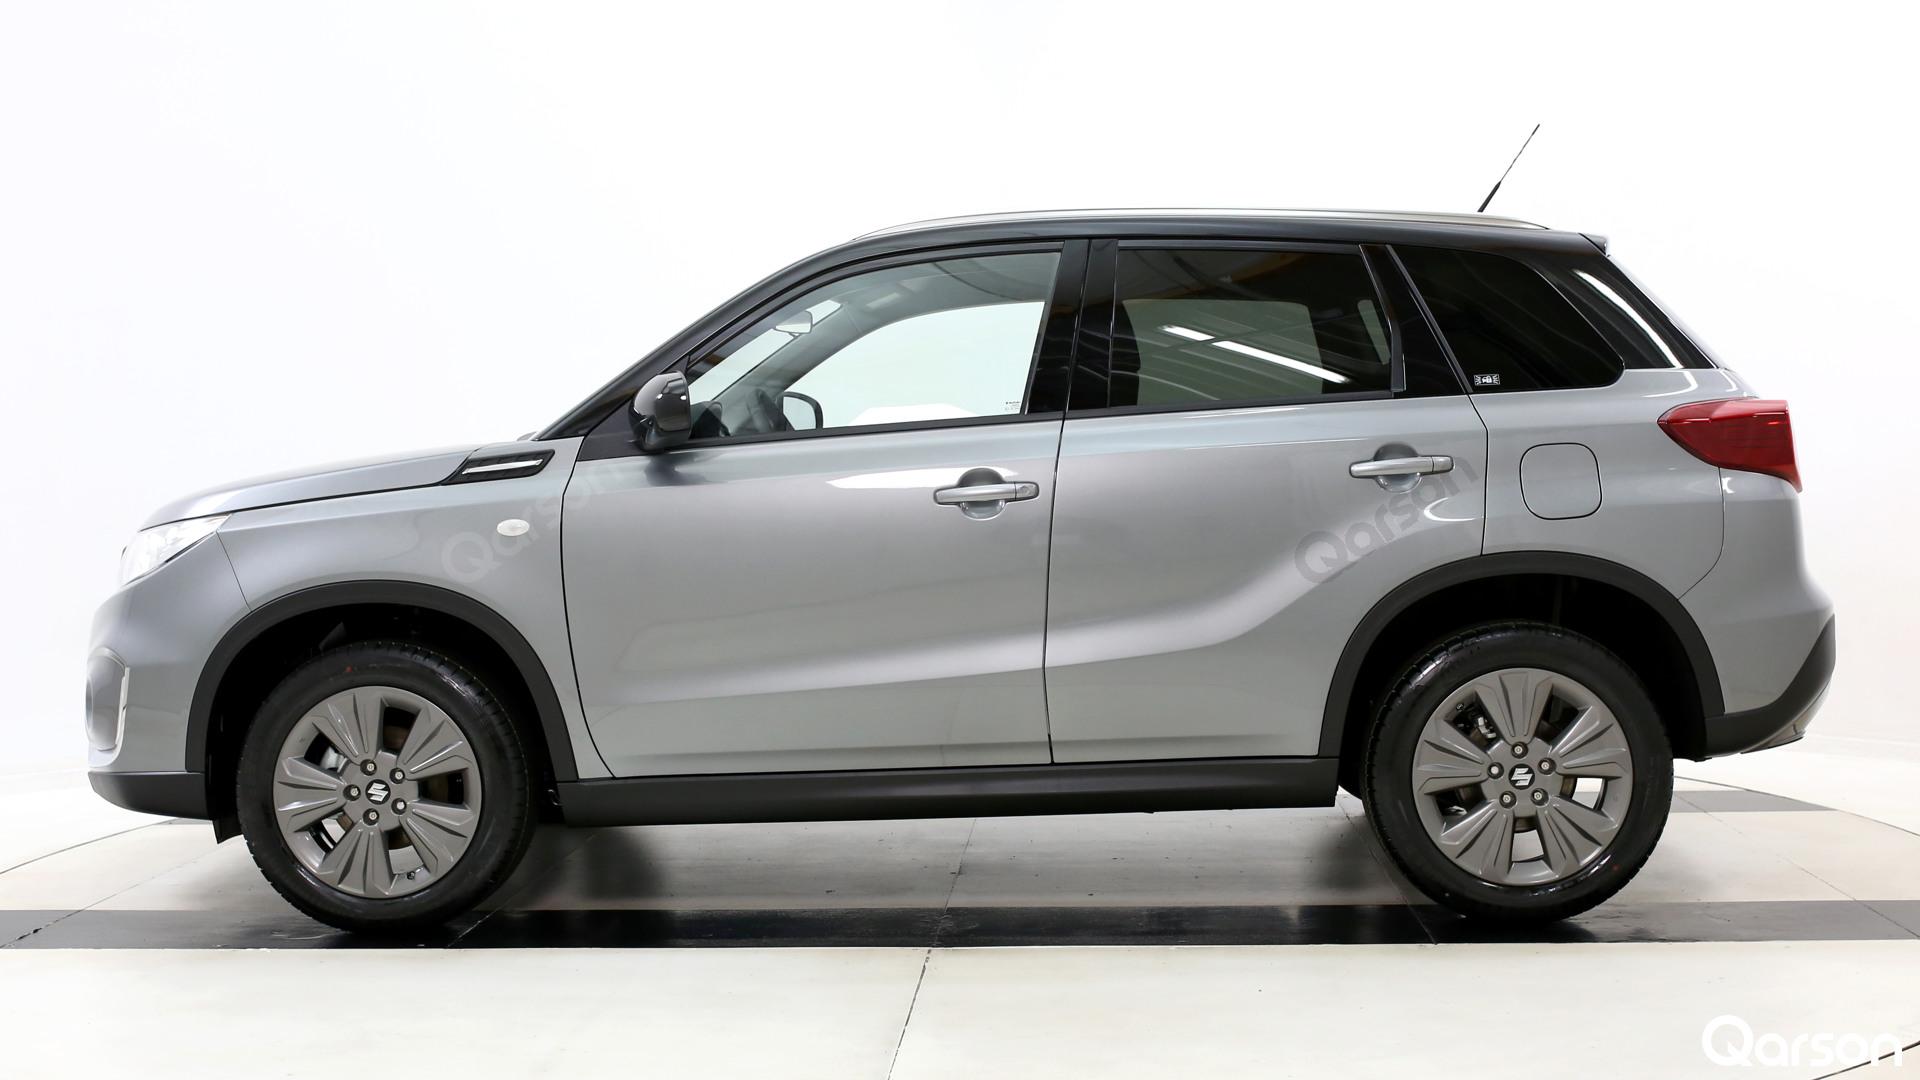 Suzuki Vitara Facelift Widok samochodu z lewego boku